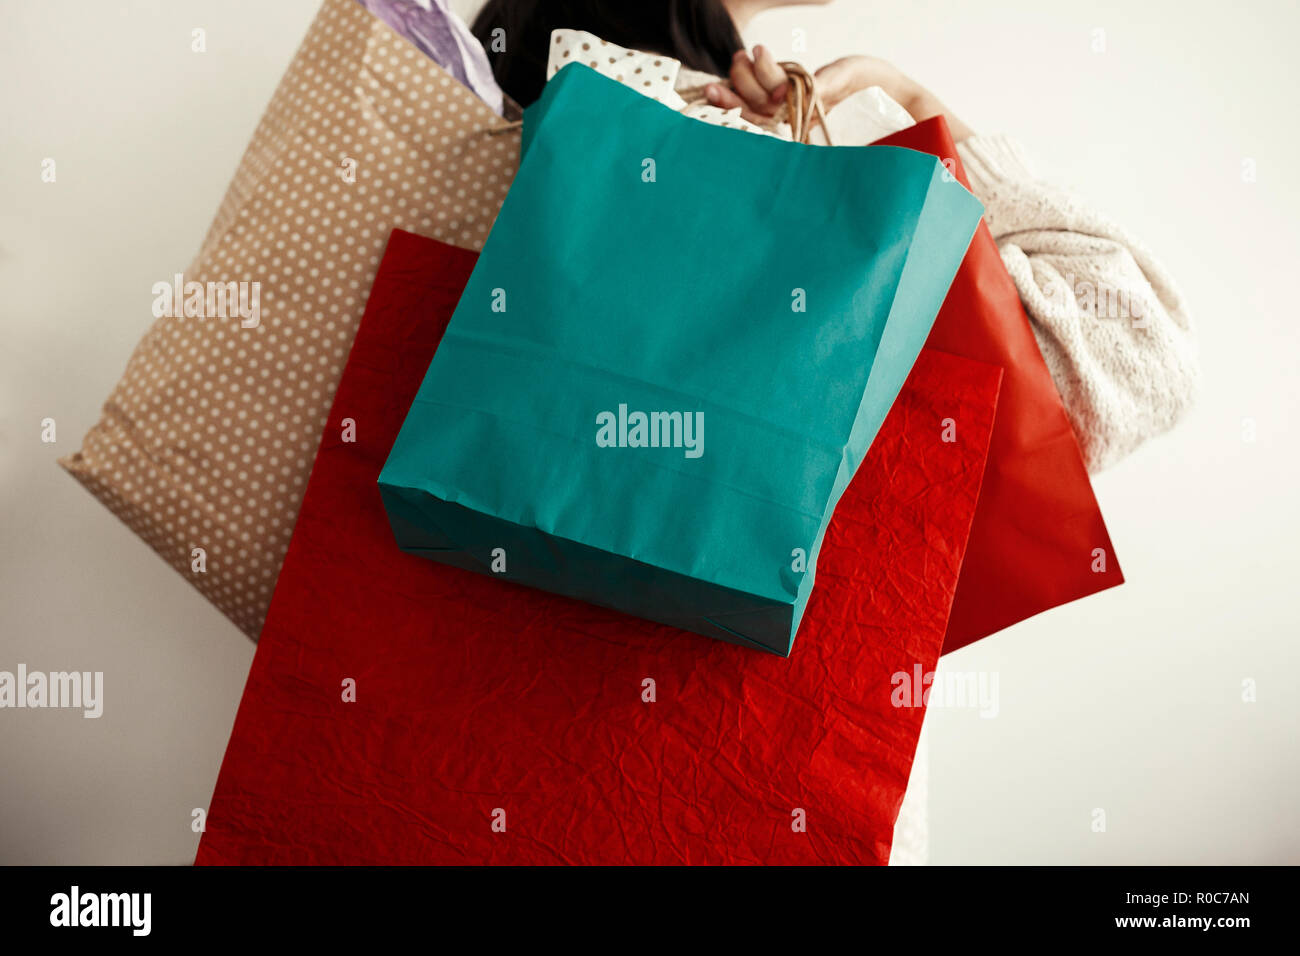 Sales Promotion Girl Stockfotos & Sales Promotion Girl Bilder - Alamy